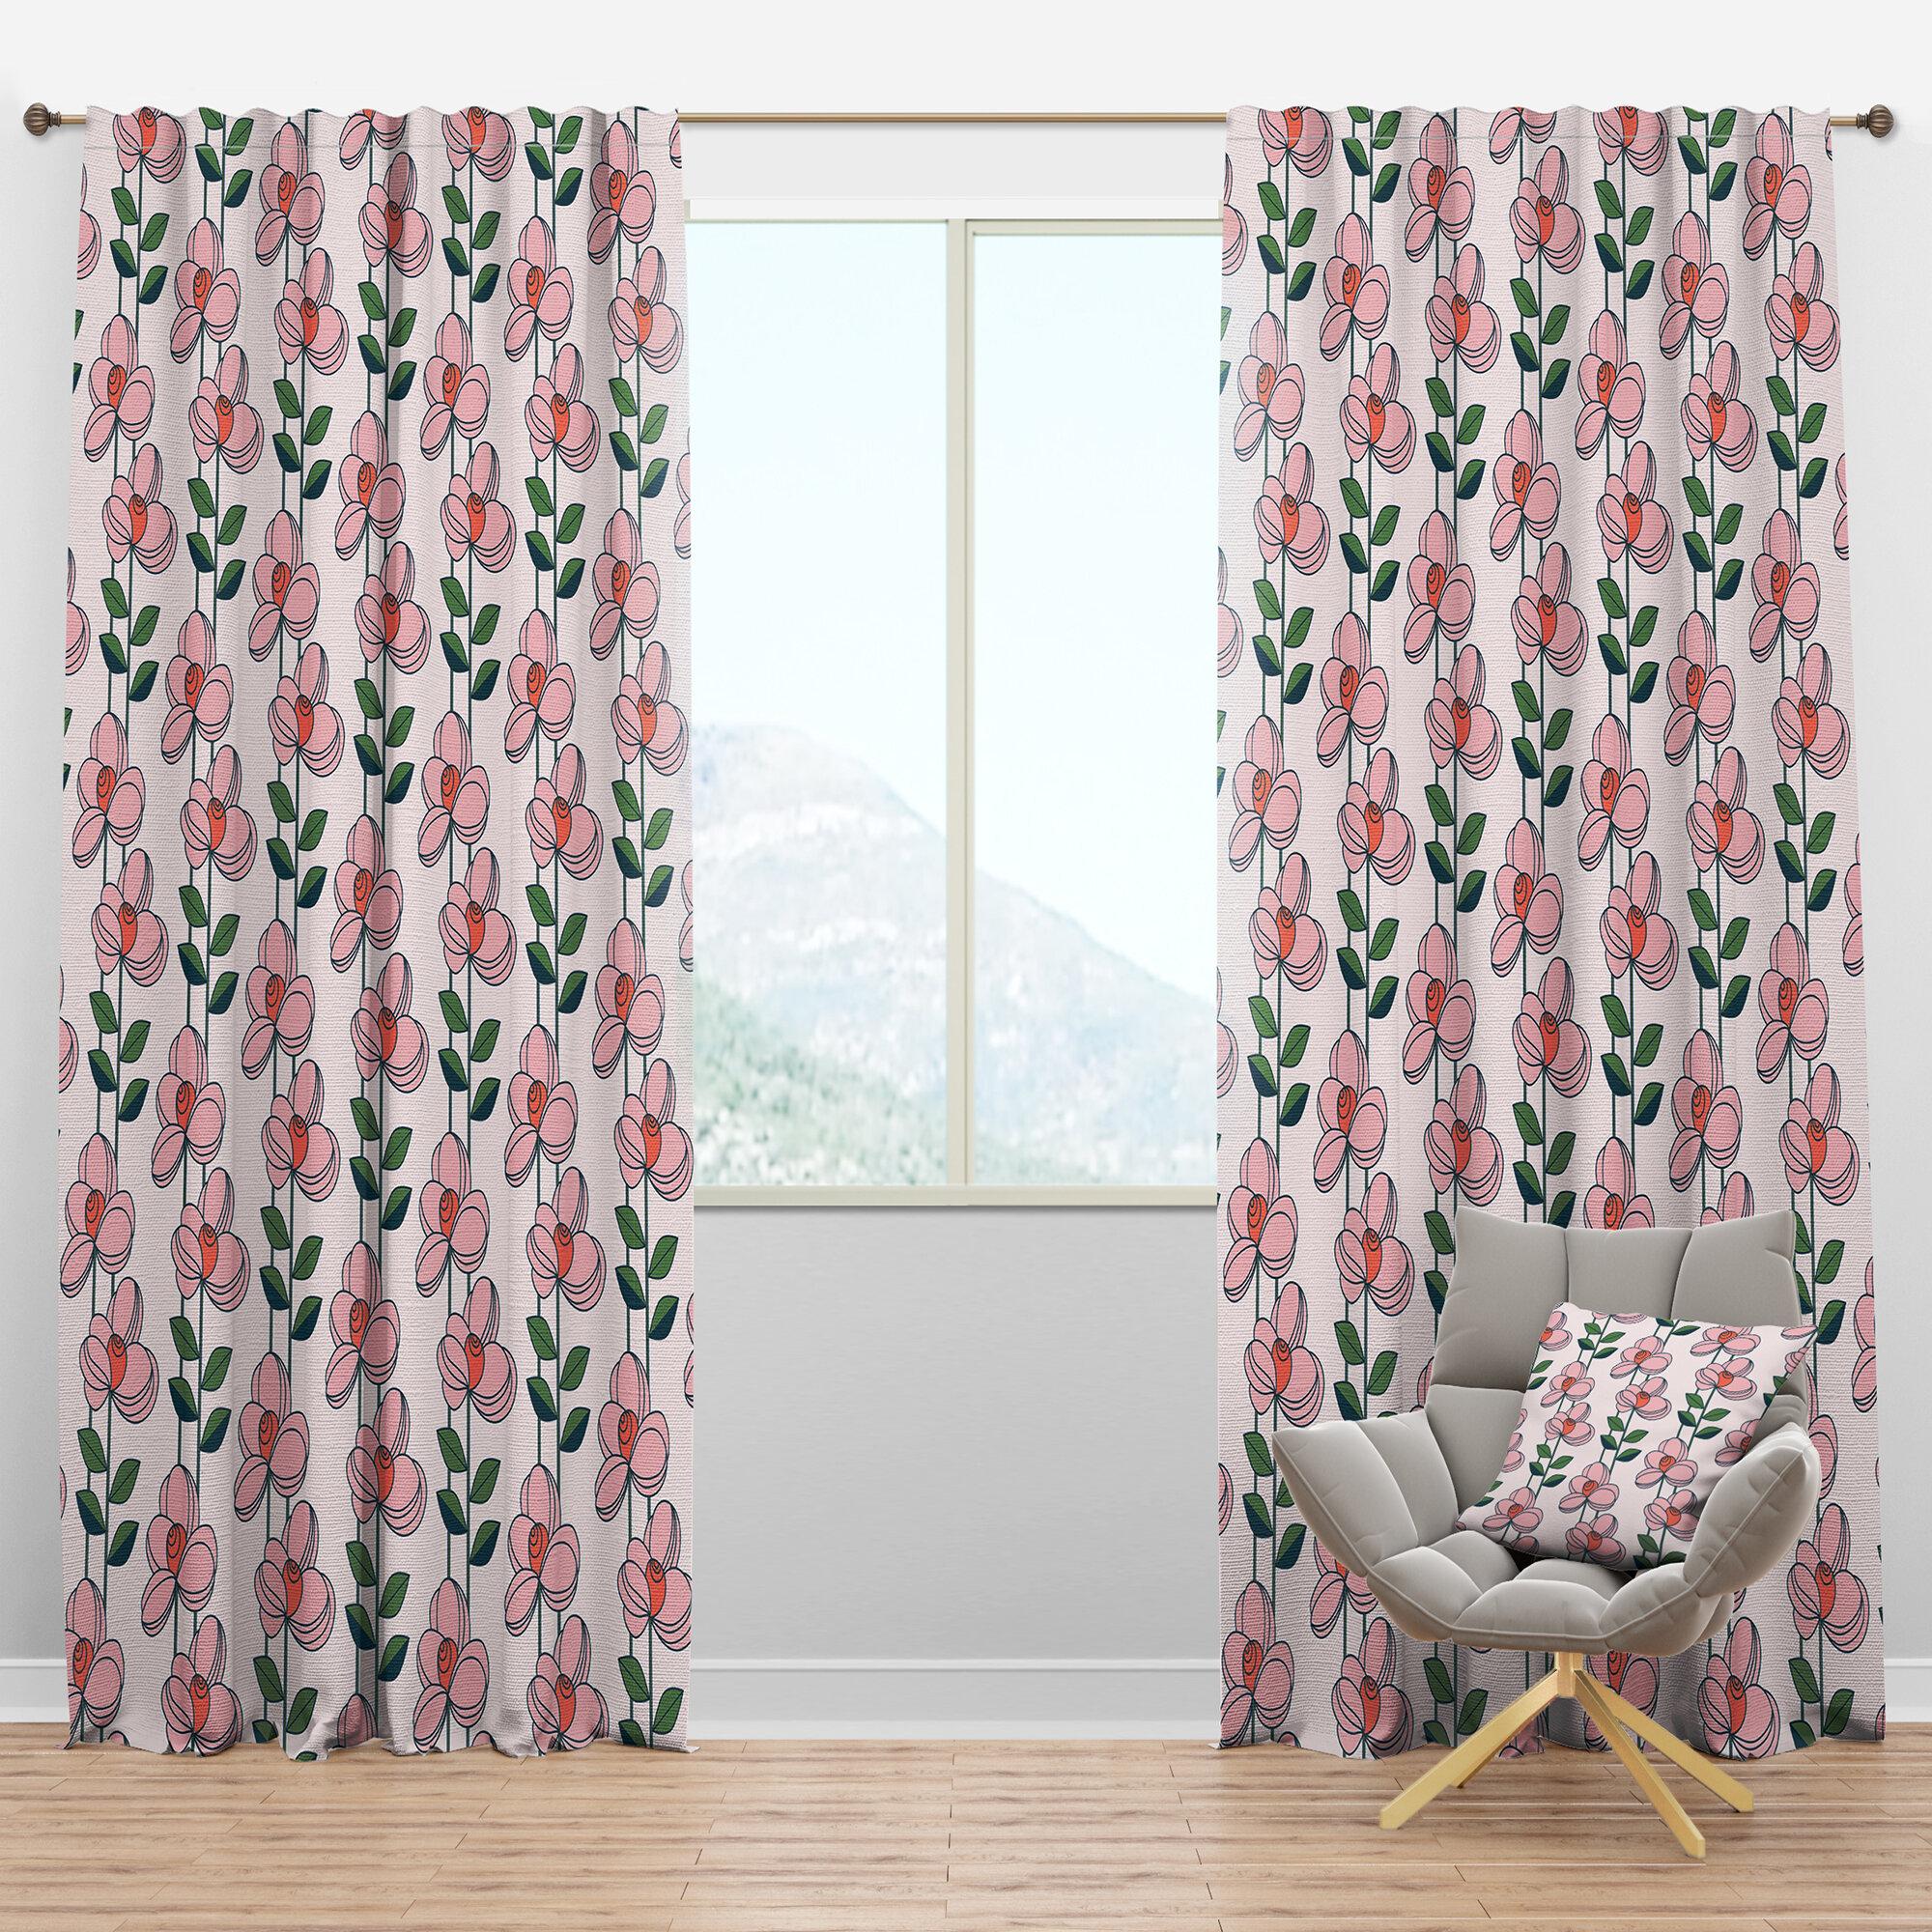 Designart Botanical Xii Floral Semi Sheer Thermal Rod Pocket Single Curtain Panel Wayfair